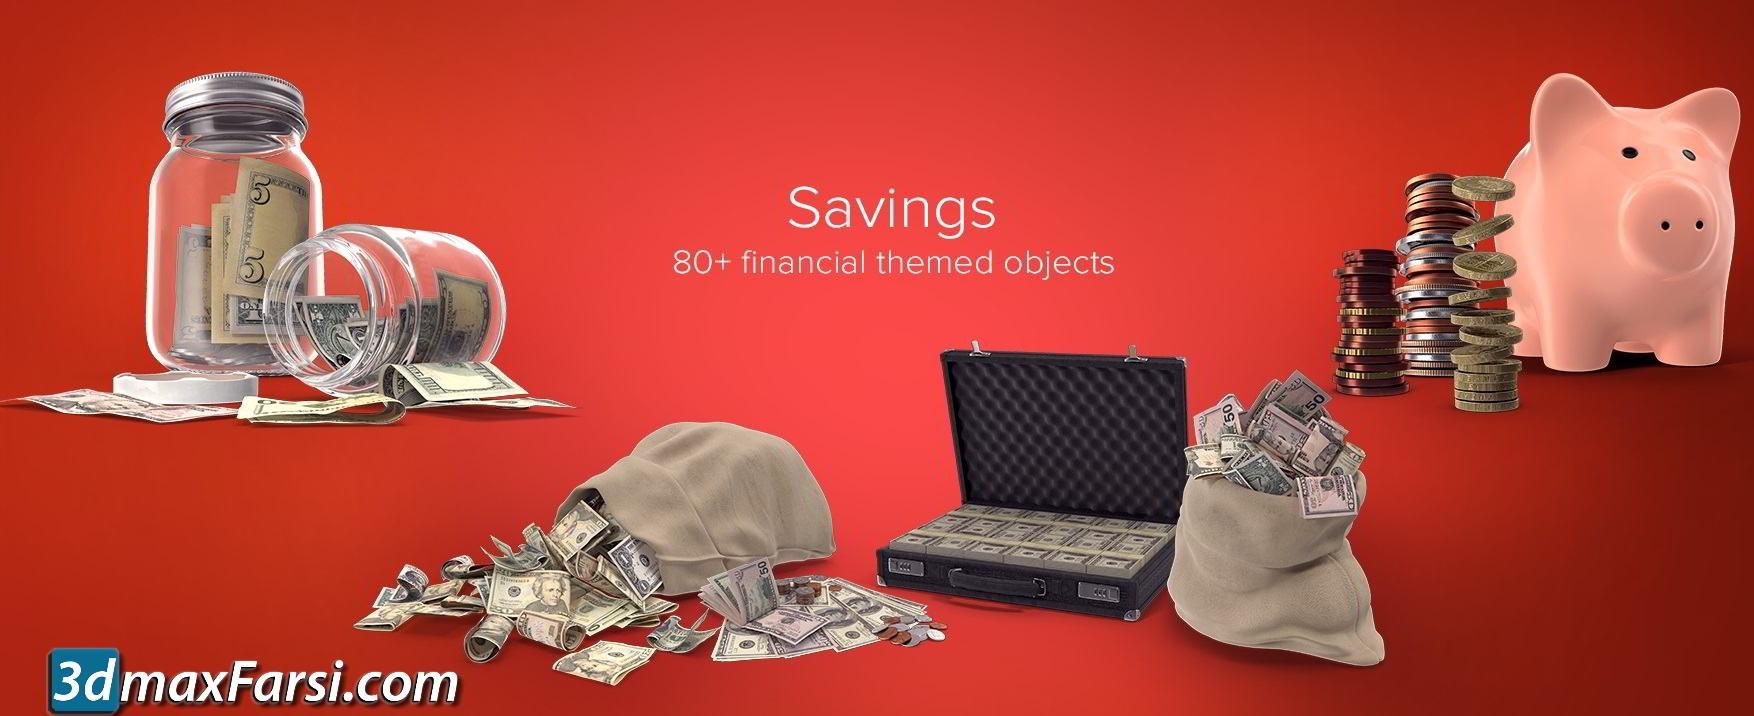 PixelSquid – Savings Collection free download